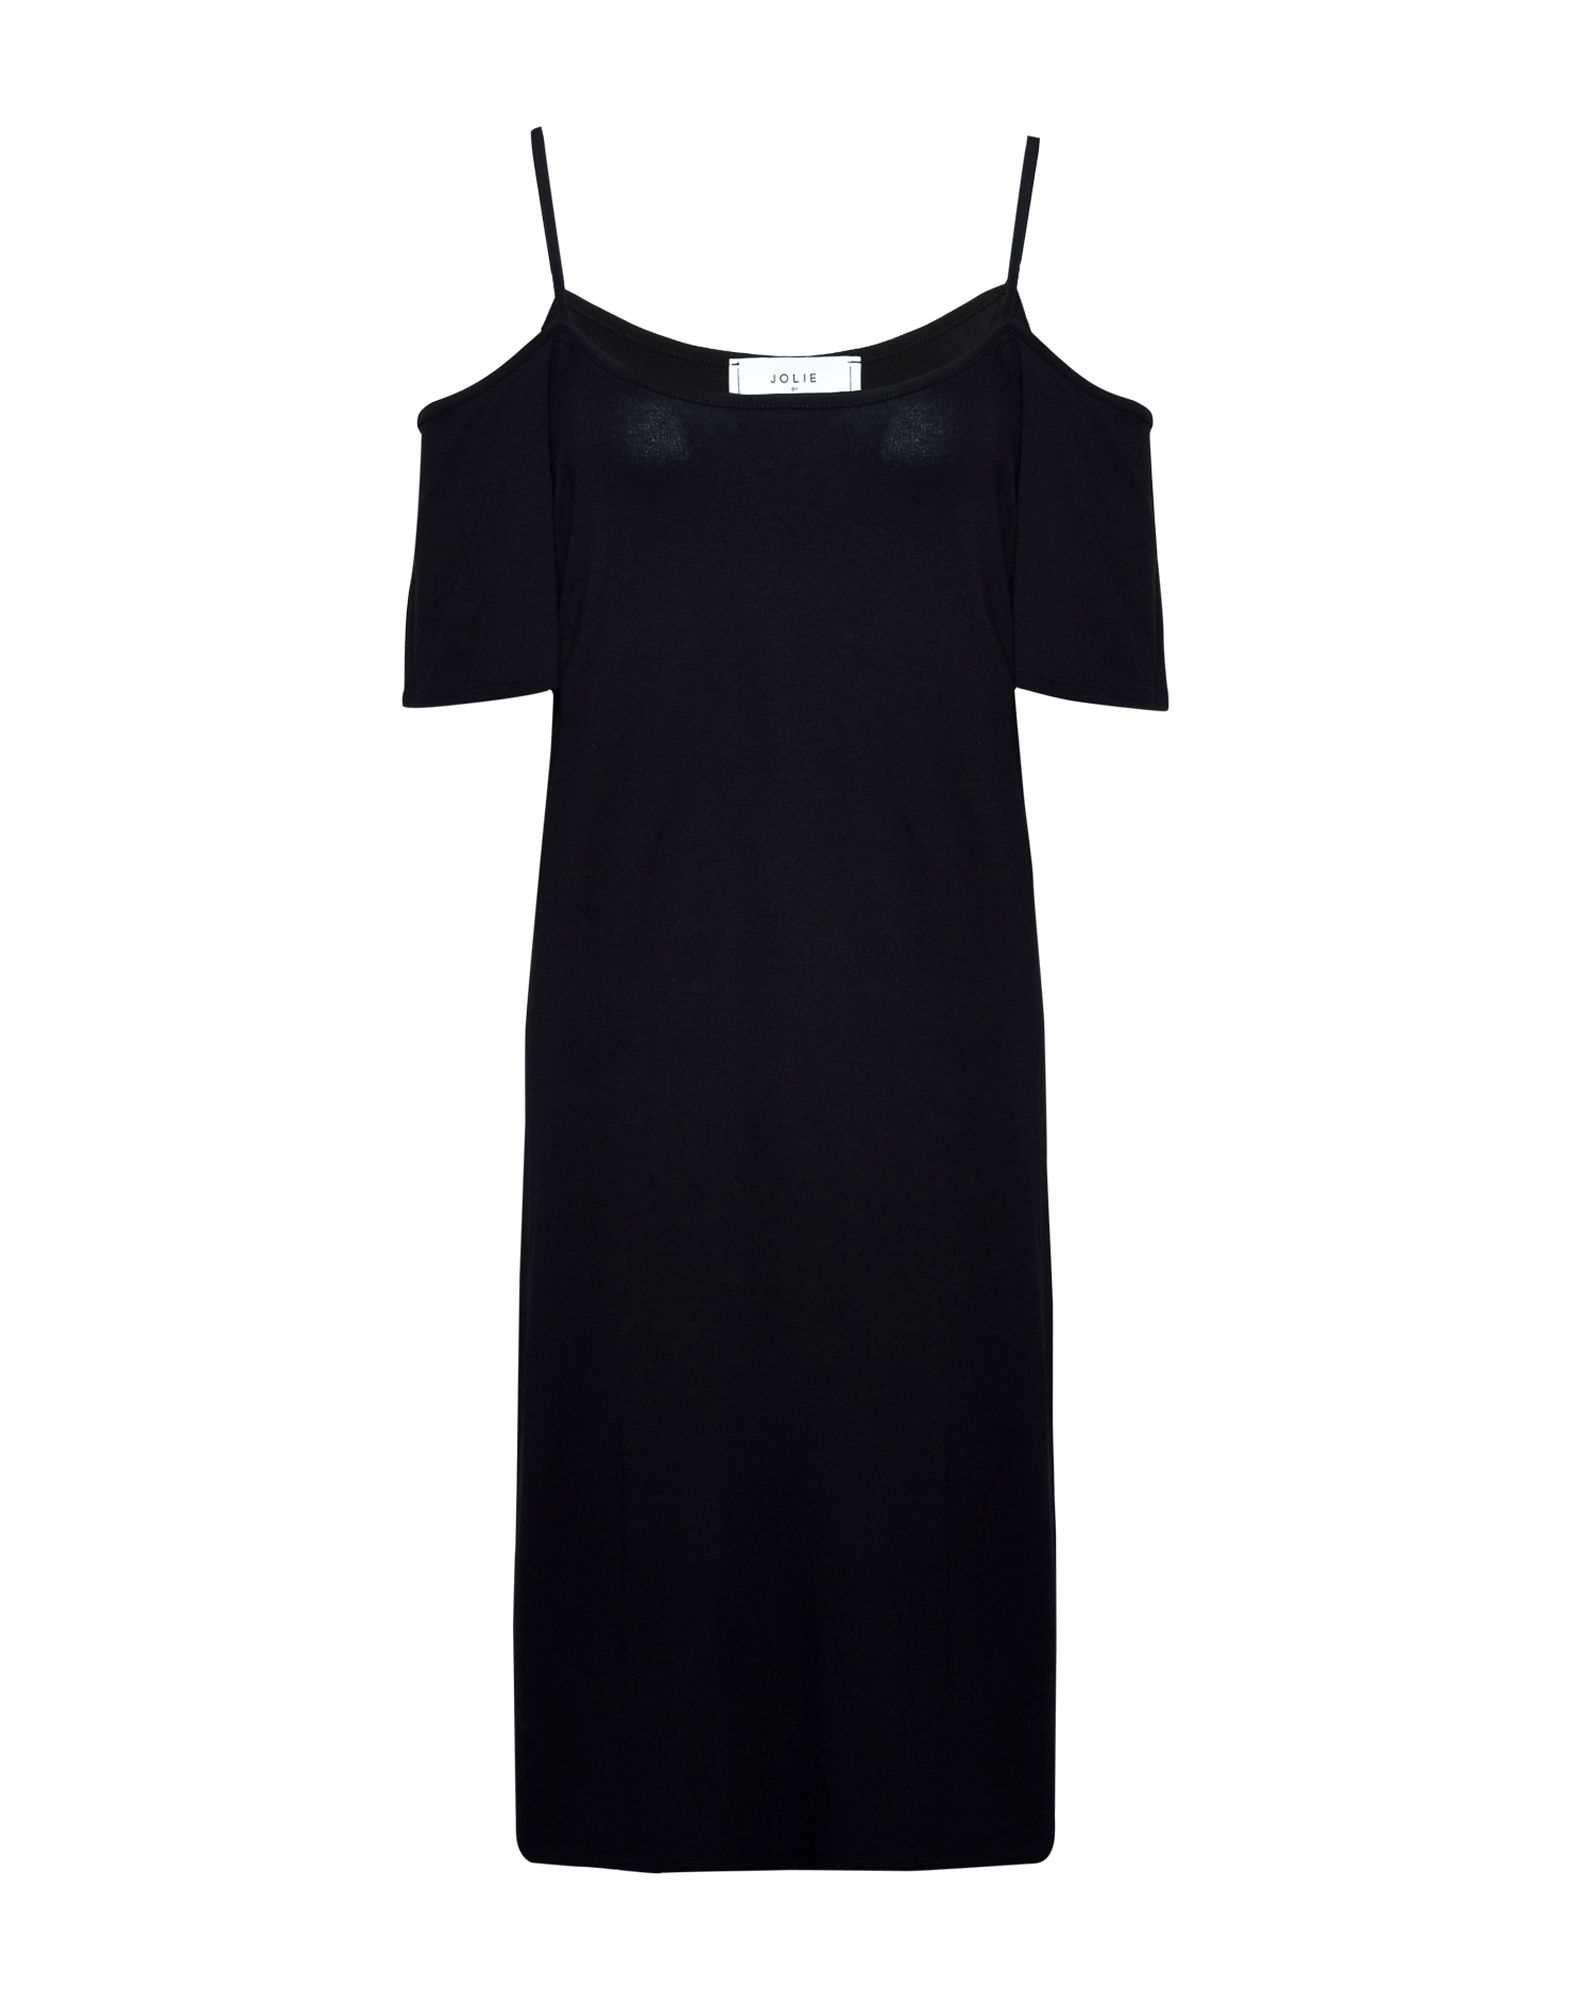 JOLIE by EDWARD SPIERS Damen Kurzes Kleid Farbe Schwarz Größe 5